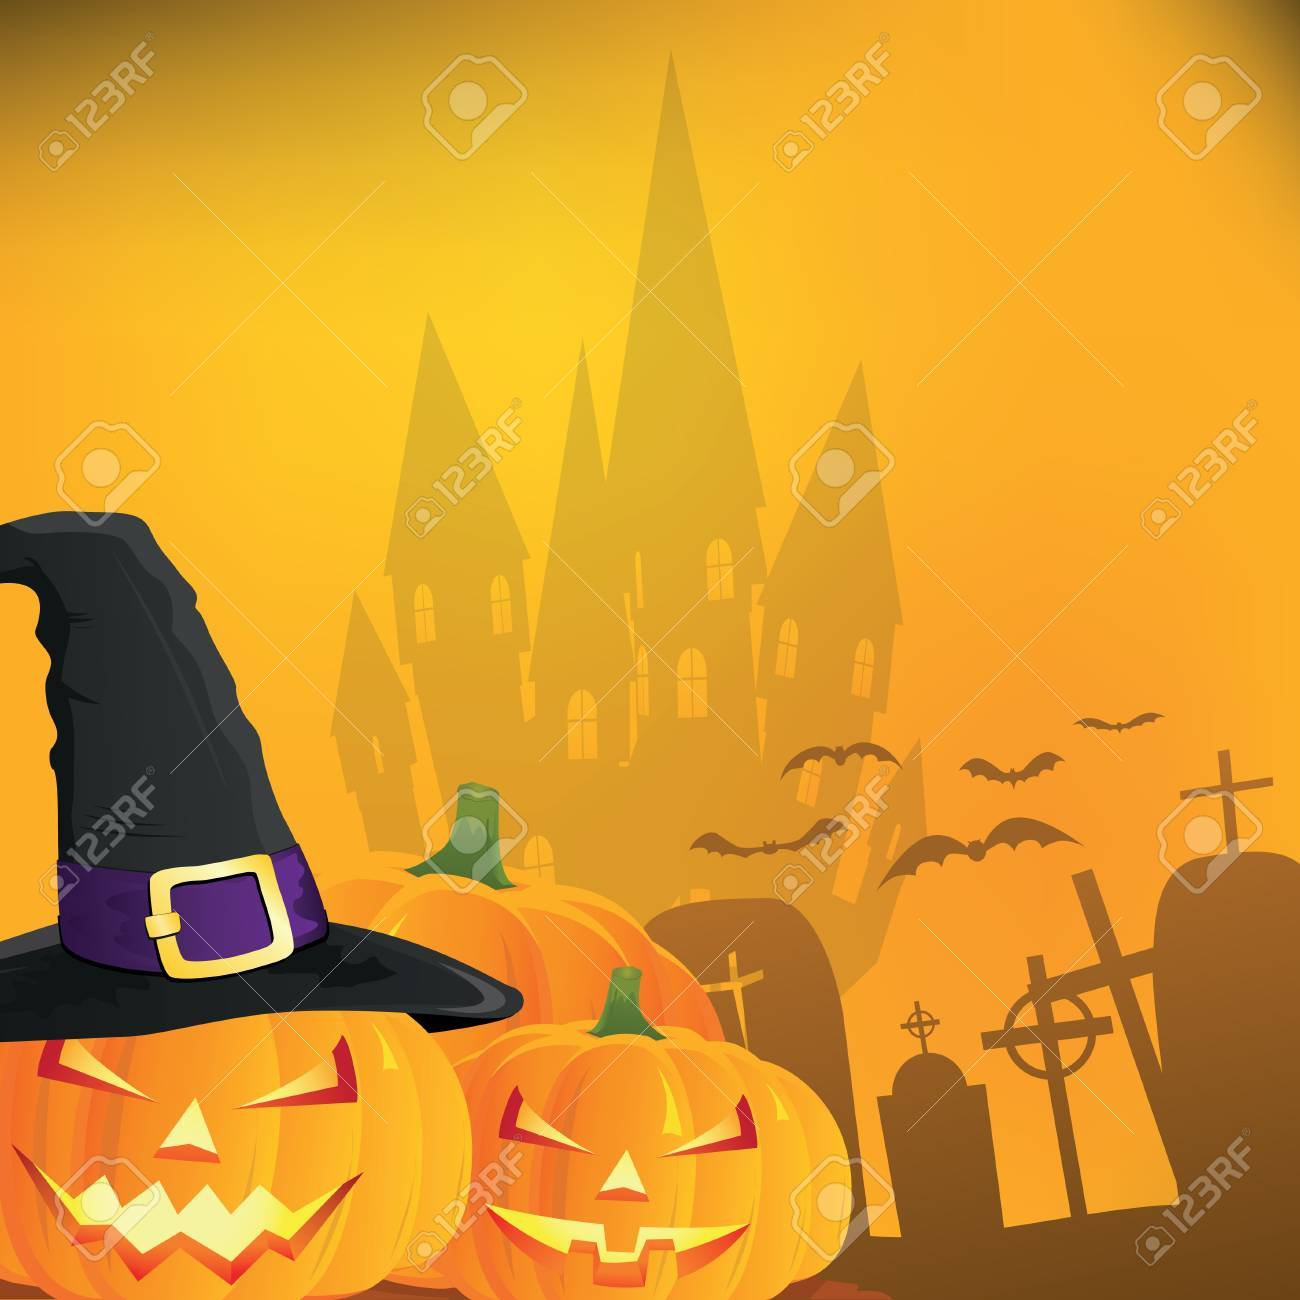 Abstract halloween background, illustration - 62197425